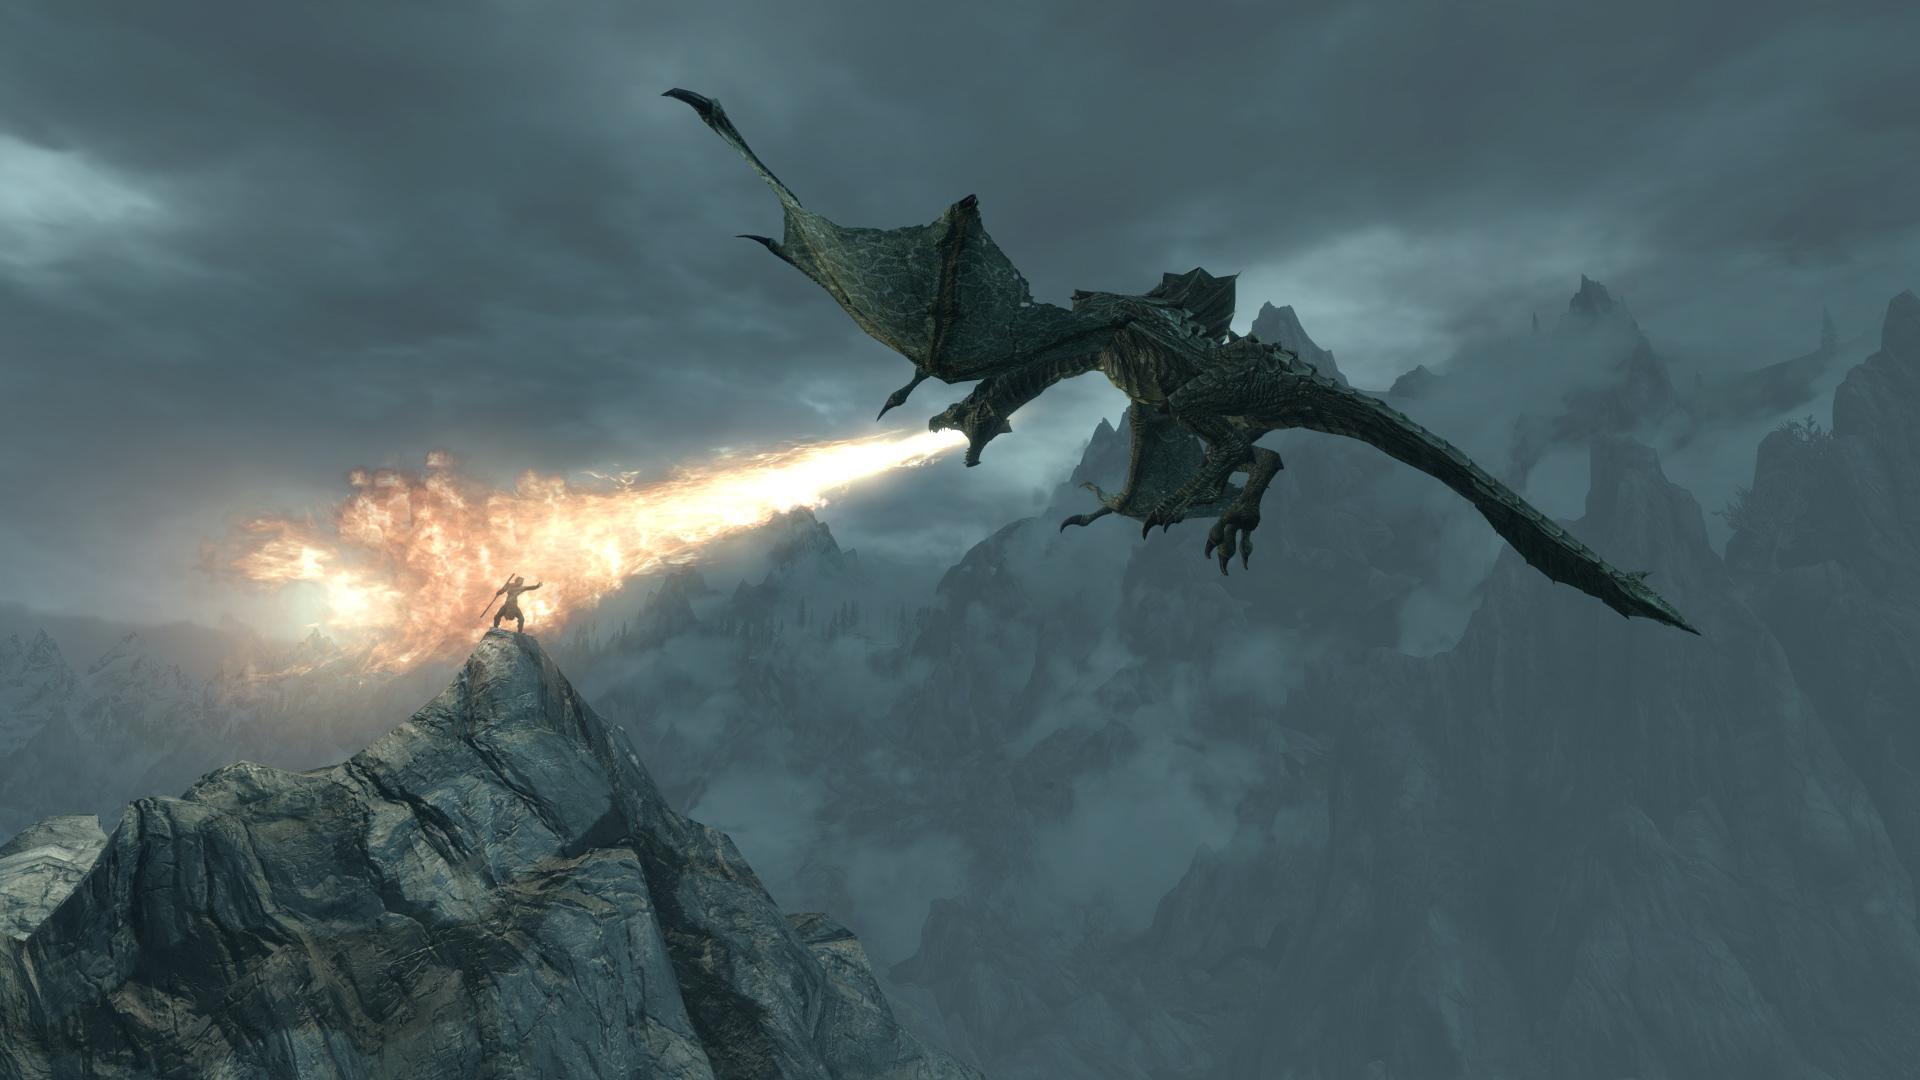 top skyrim dragon background